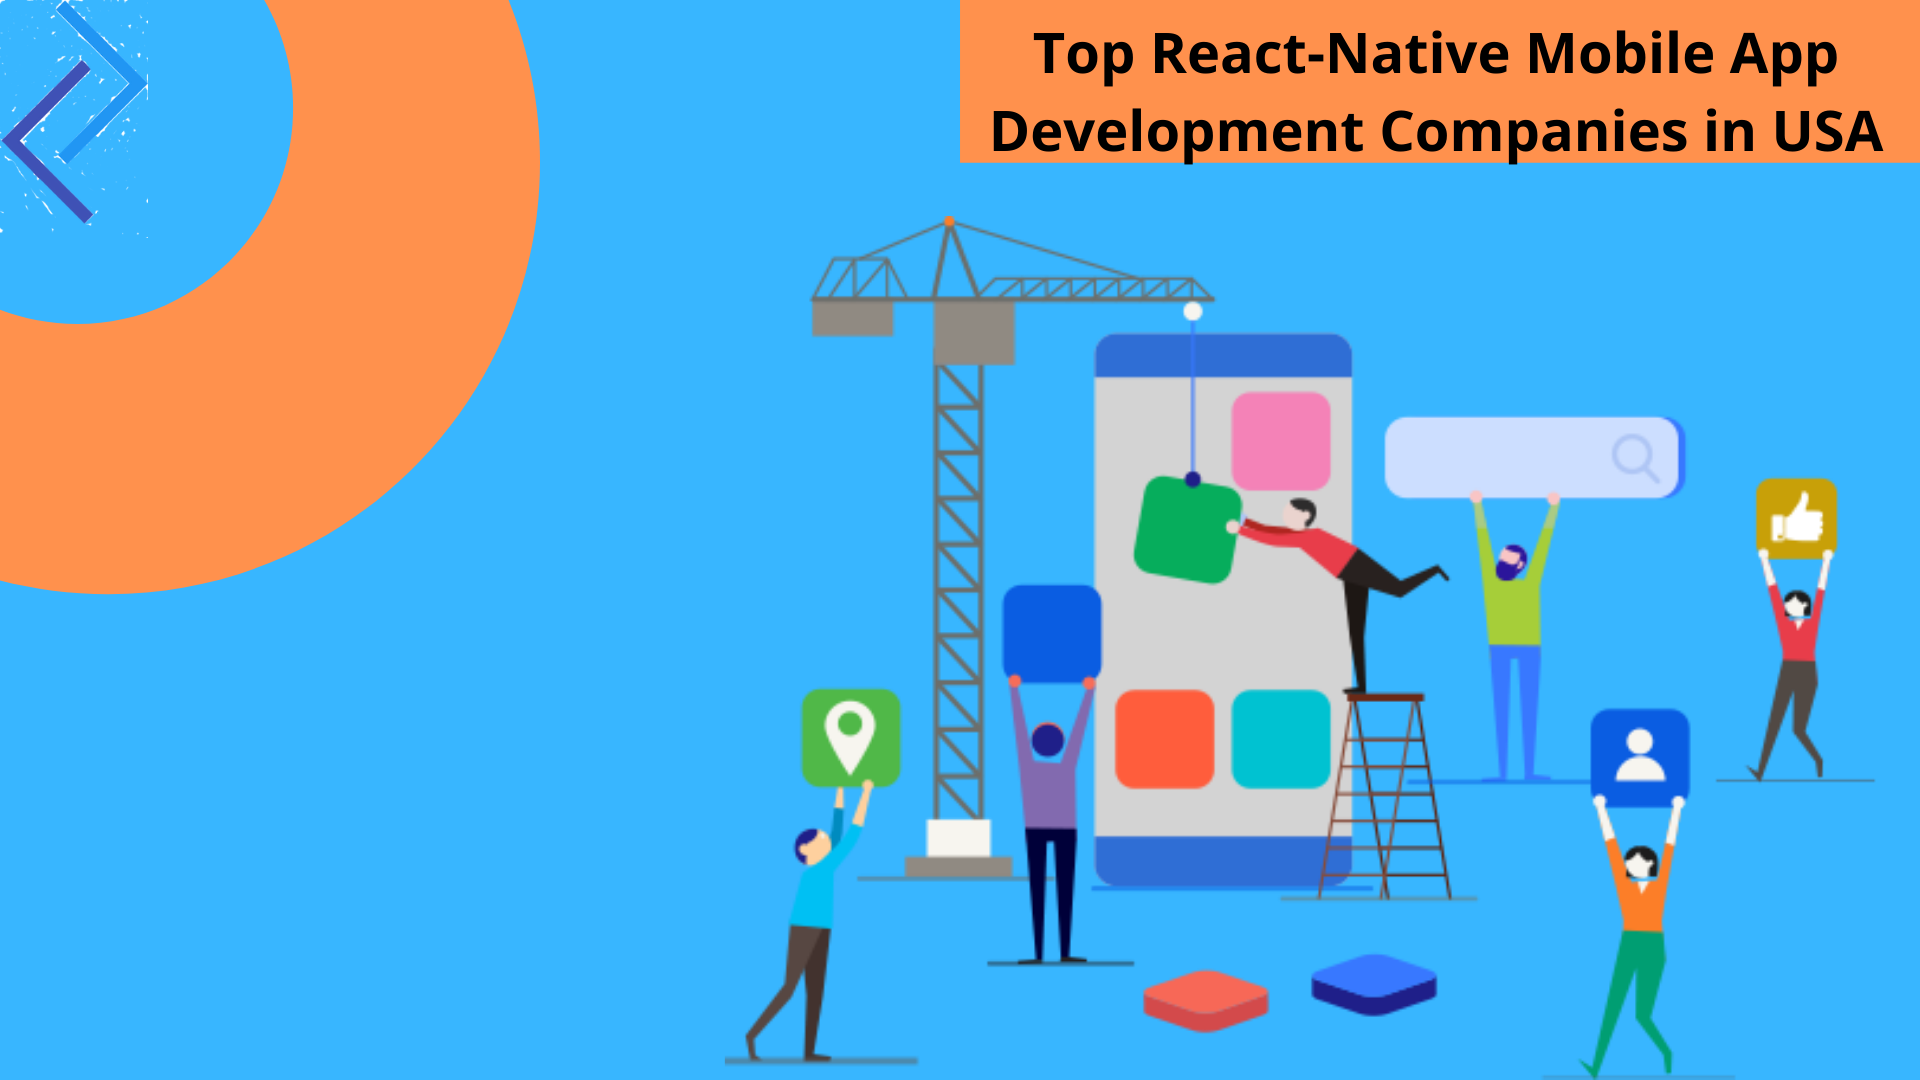 Top React-Native Mobile App Development Companies in USA